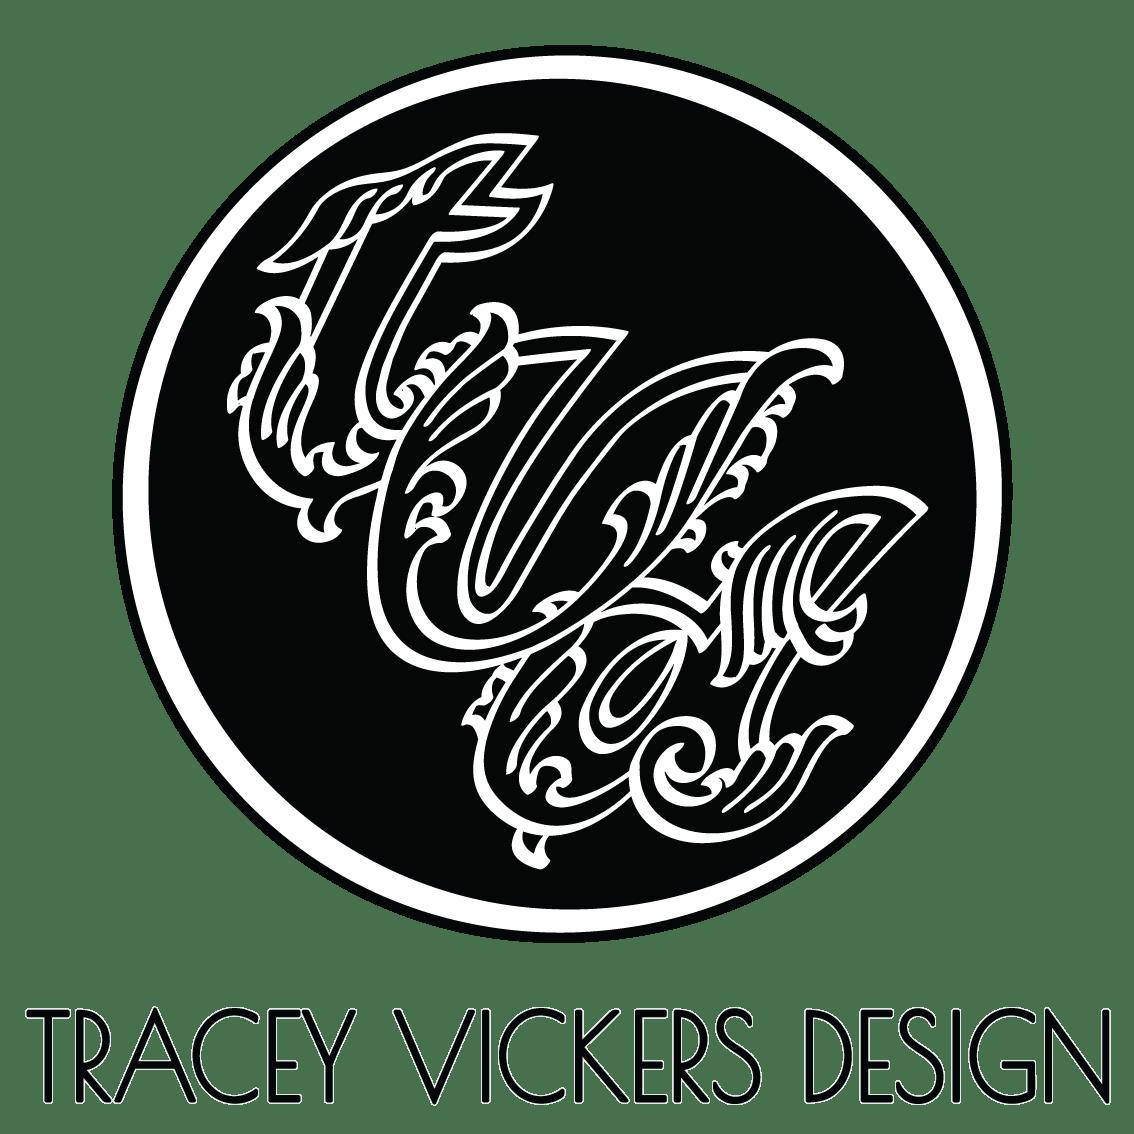 Tracey Vickers Design